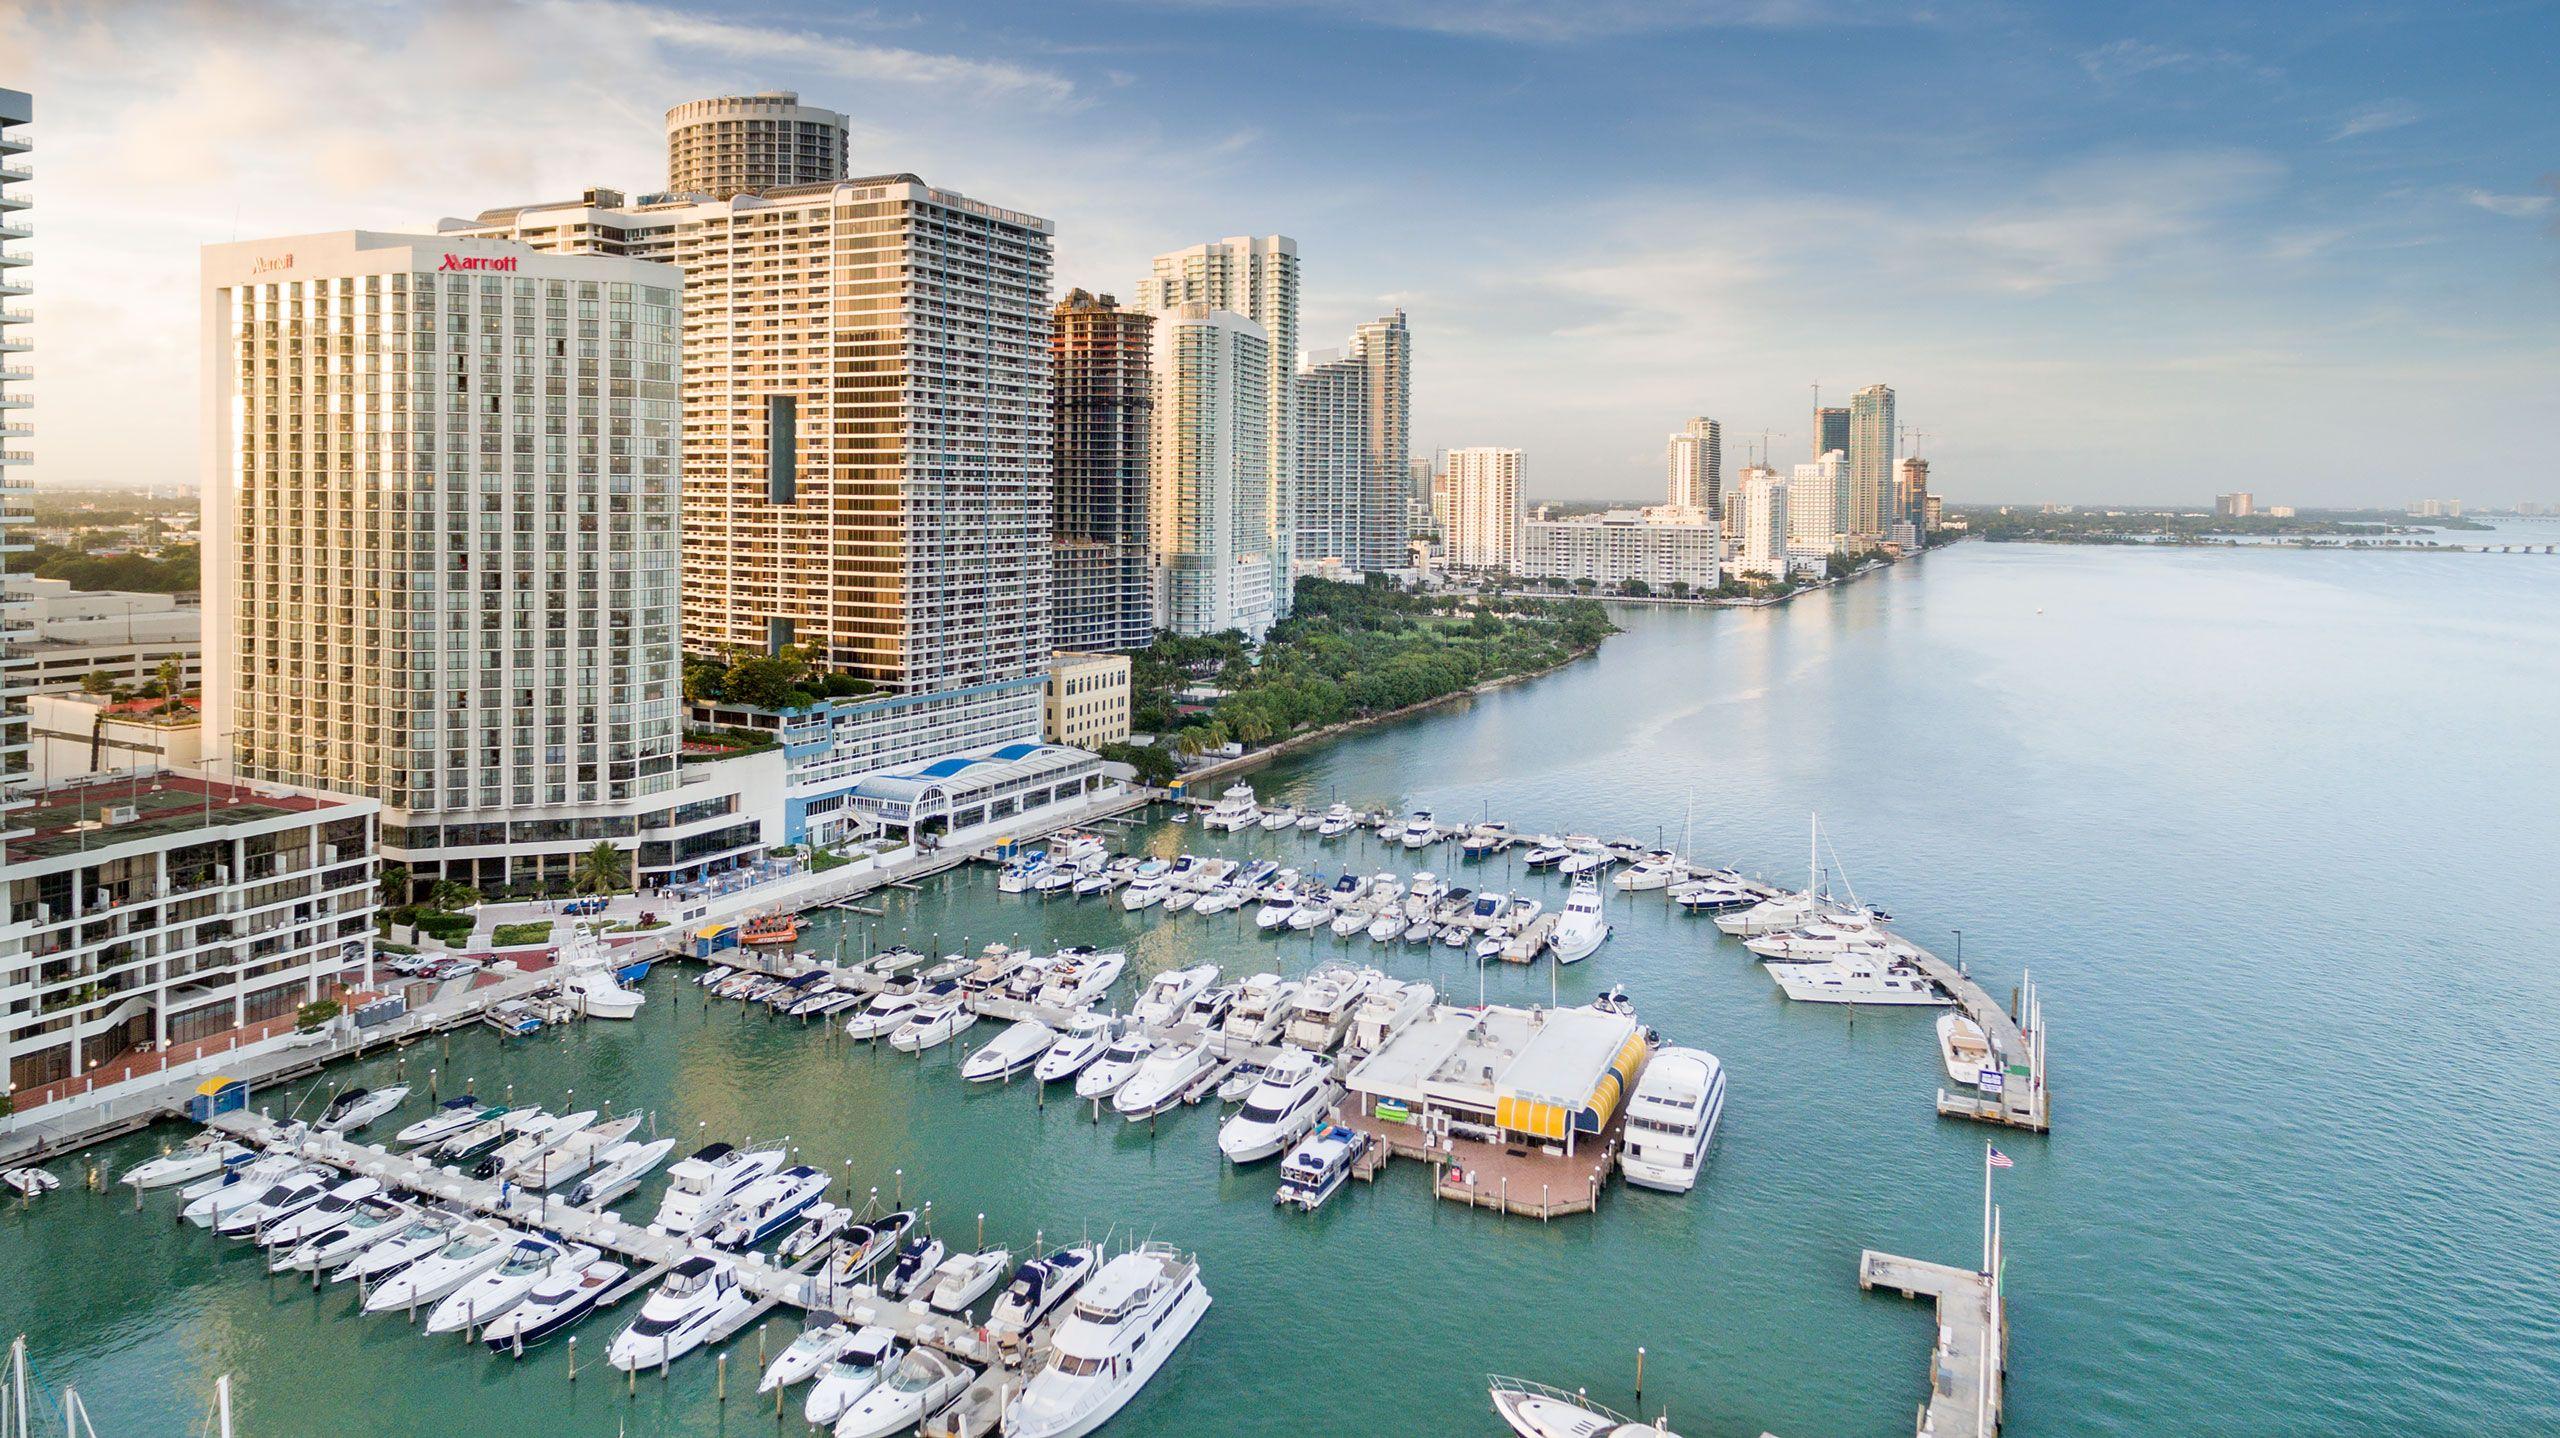 Marriott Biscayne Bay, Miami, Florida